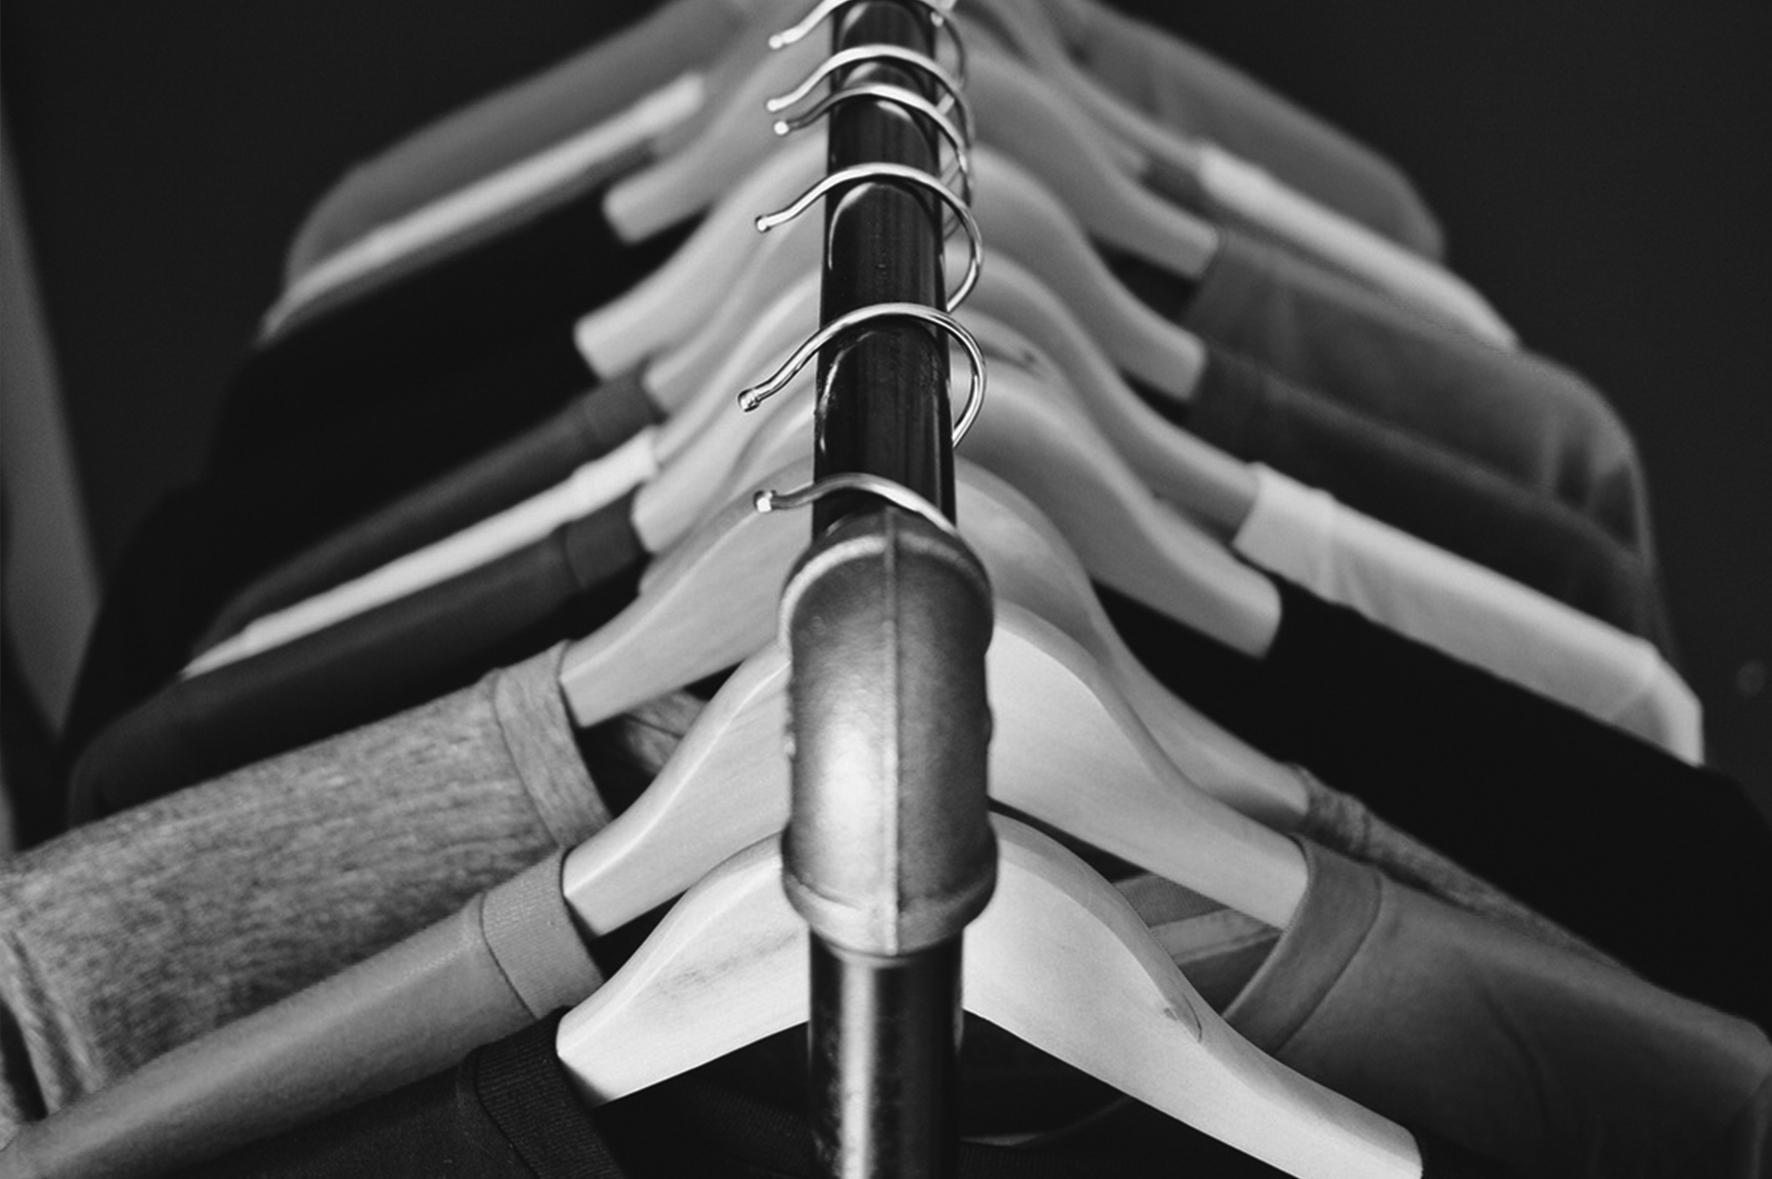 Shirt design uber - Shirtdesign Einfreigeistlabor Freigeistlabor